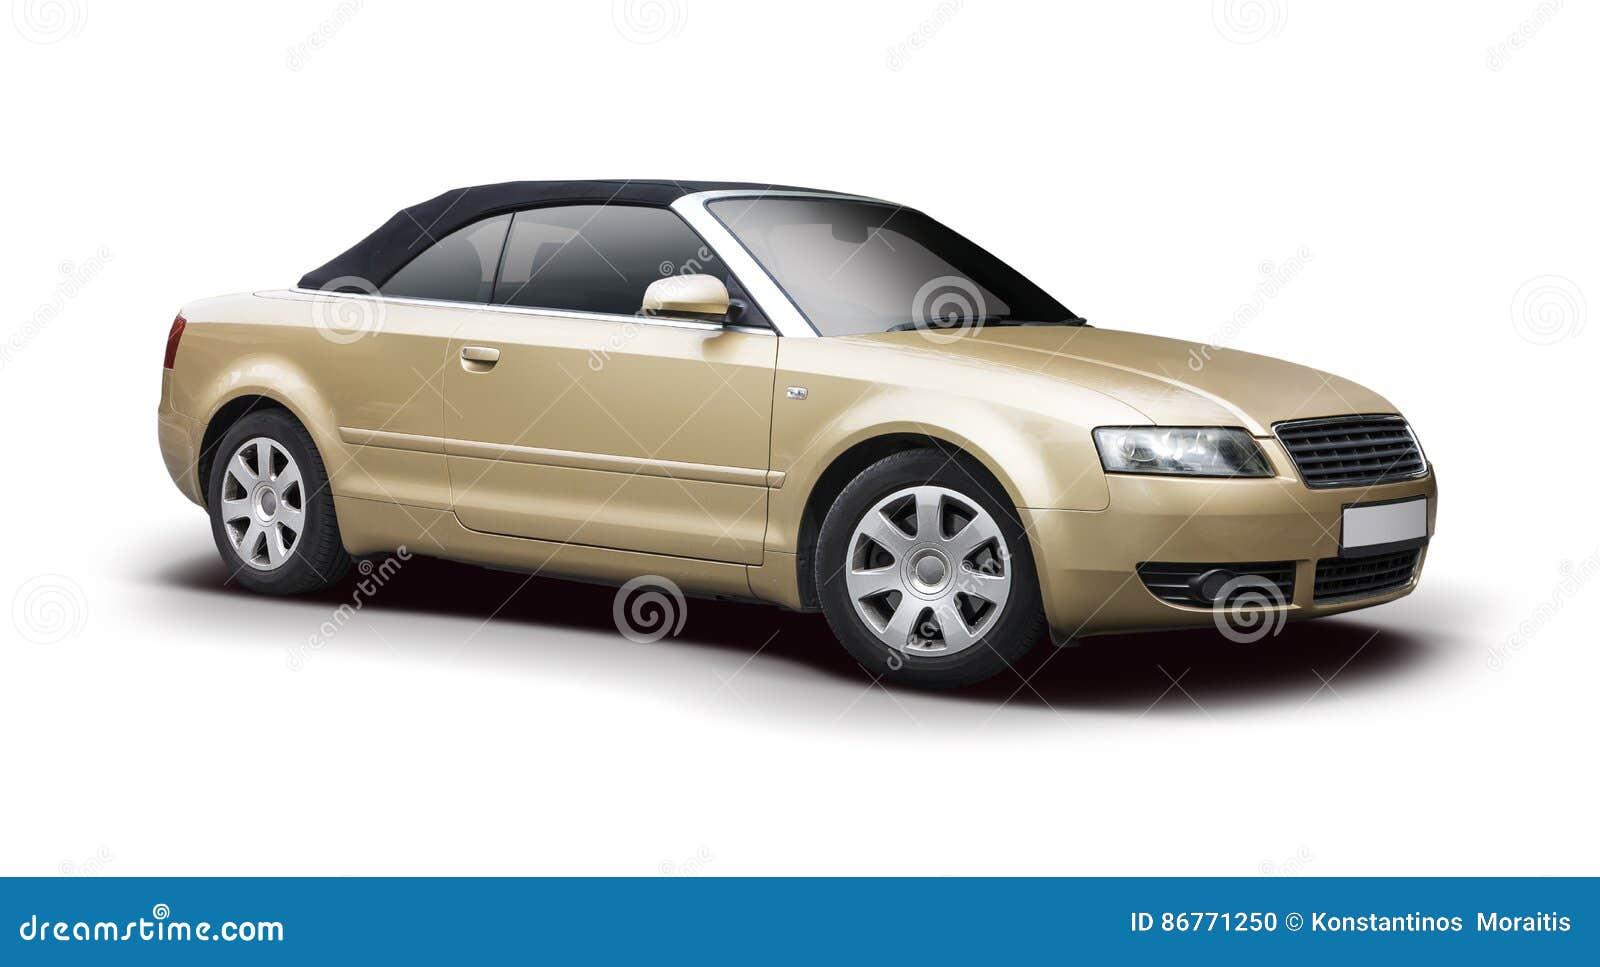 Audi A4 Cabrio Stock Photo Image Of View Isolated Cabrio 86771250